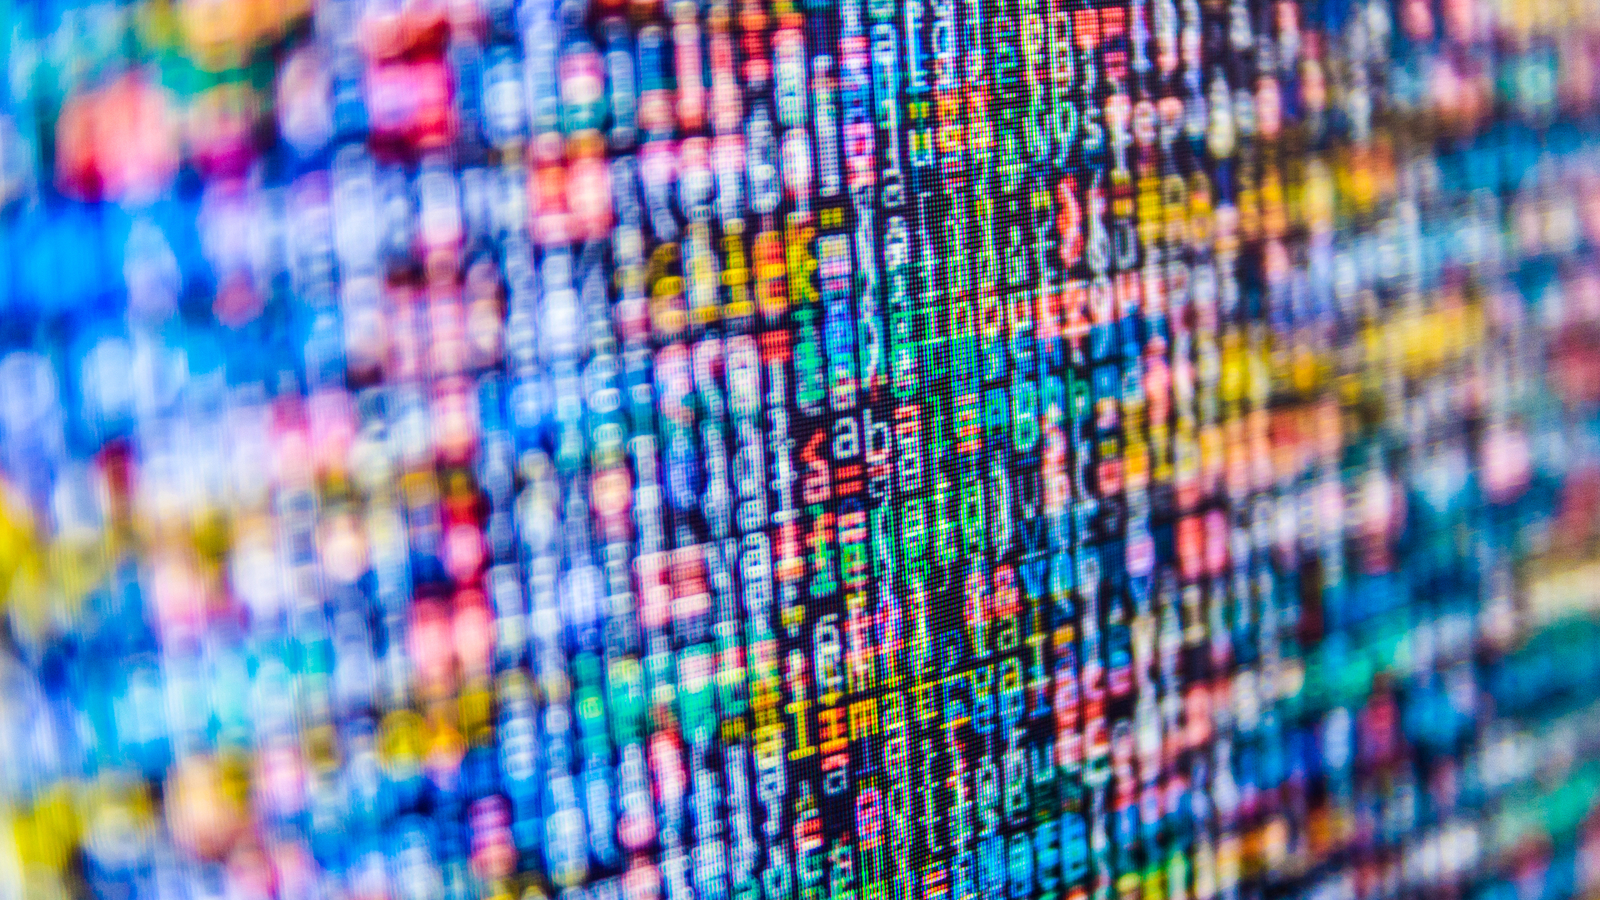 Photo of multicoloured code on screen.